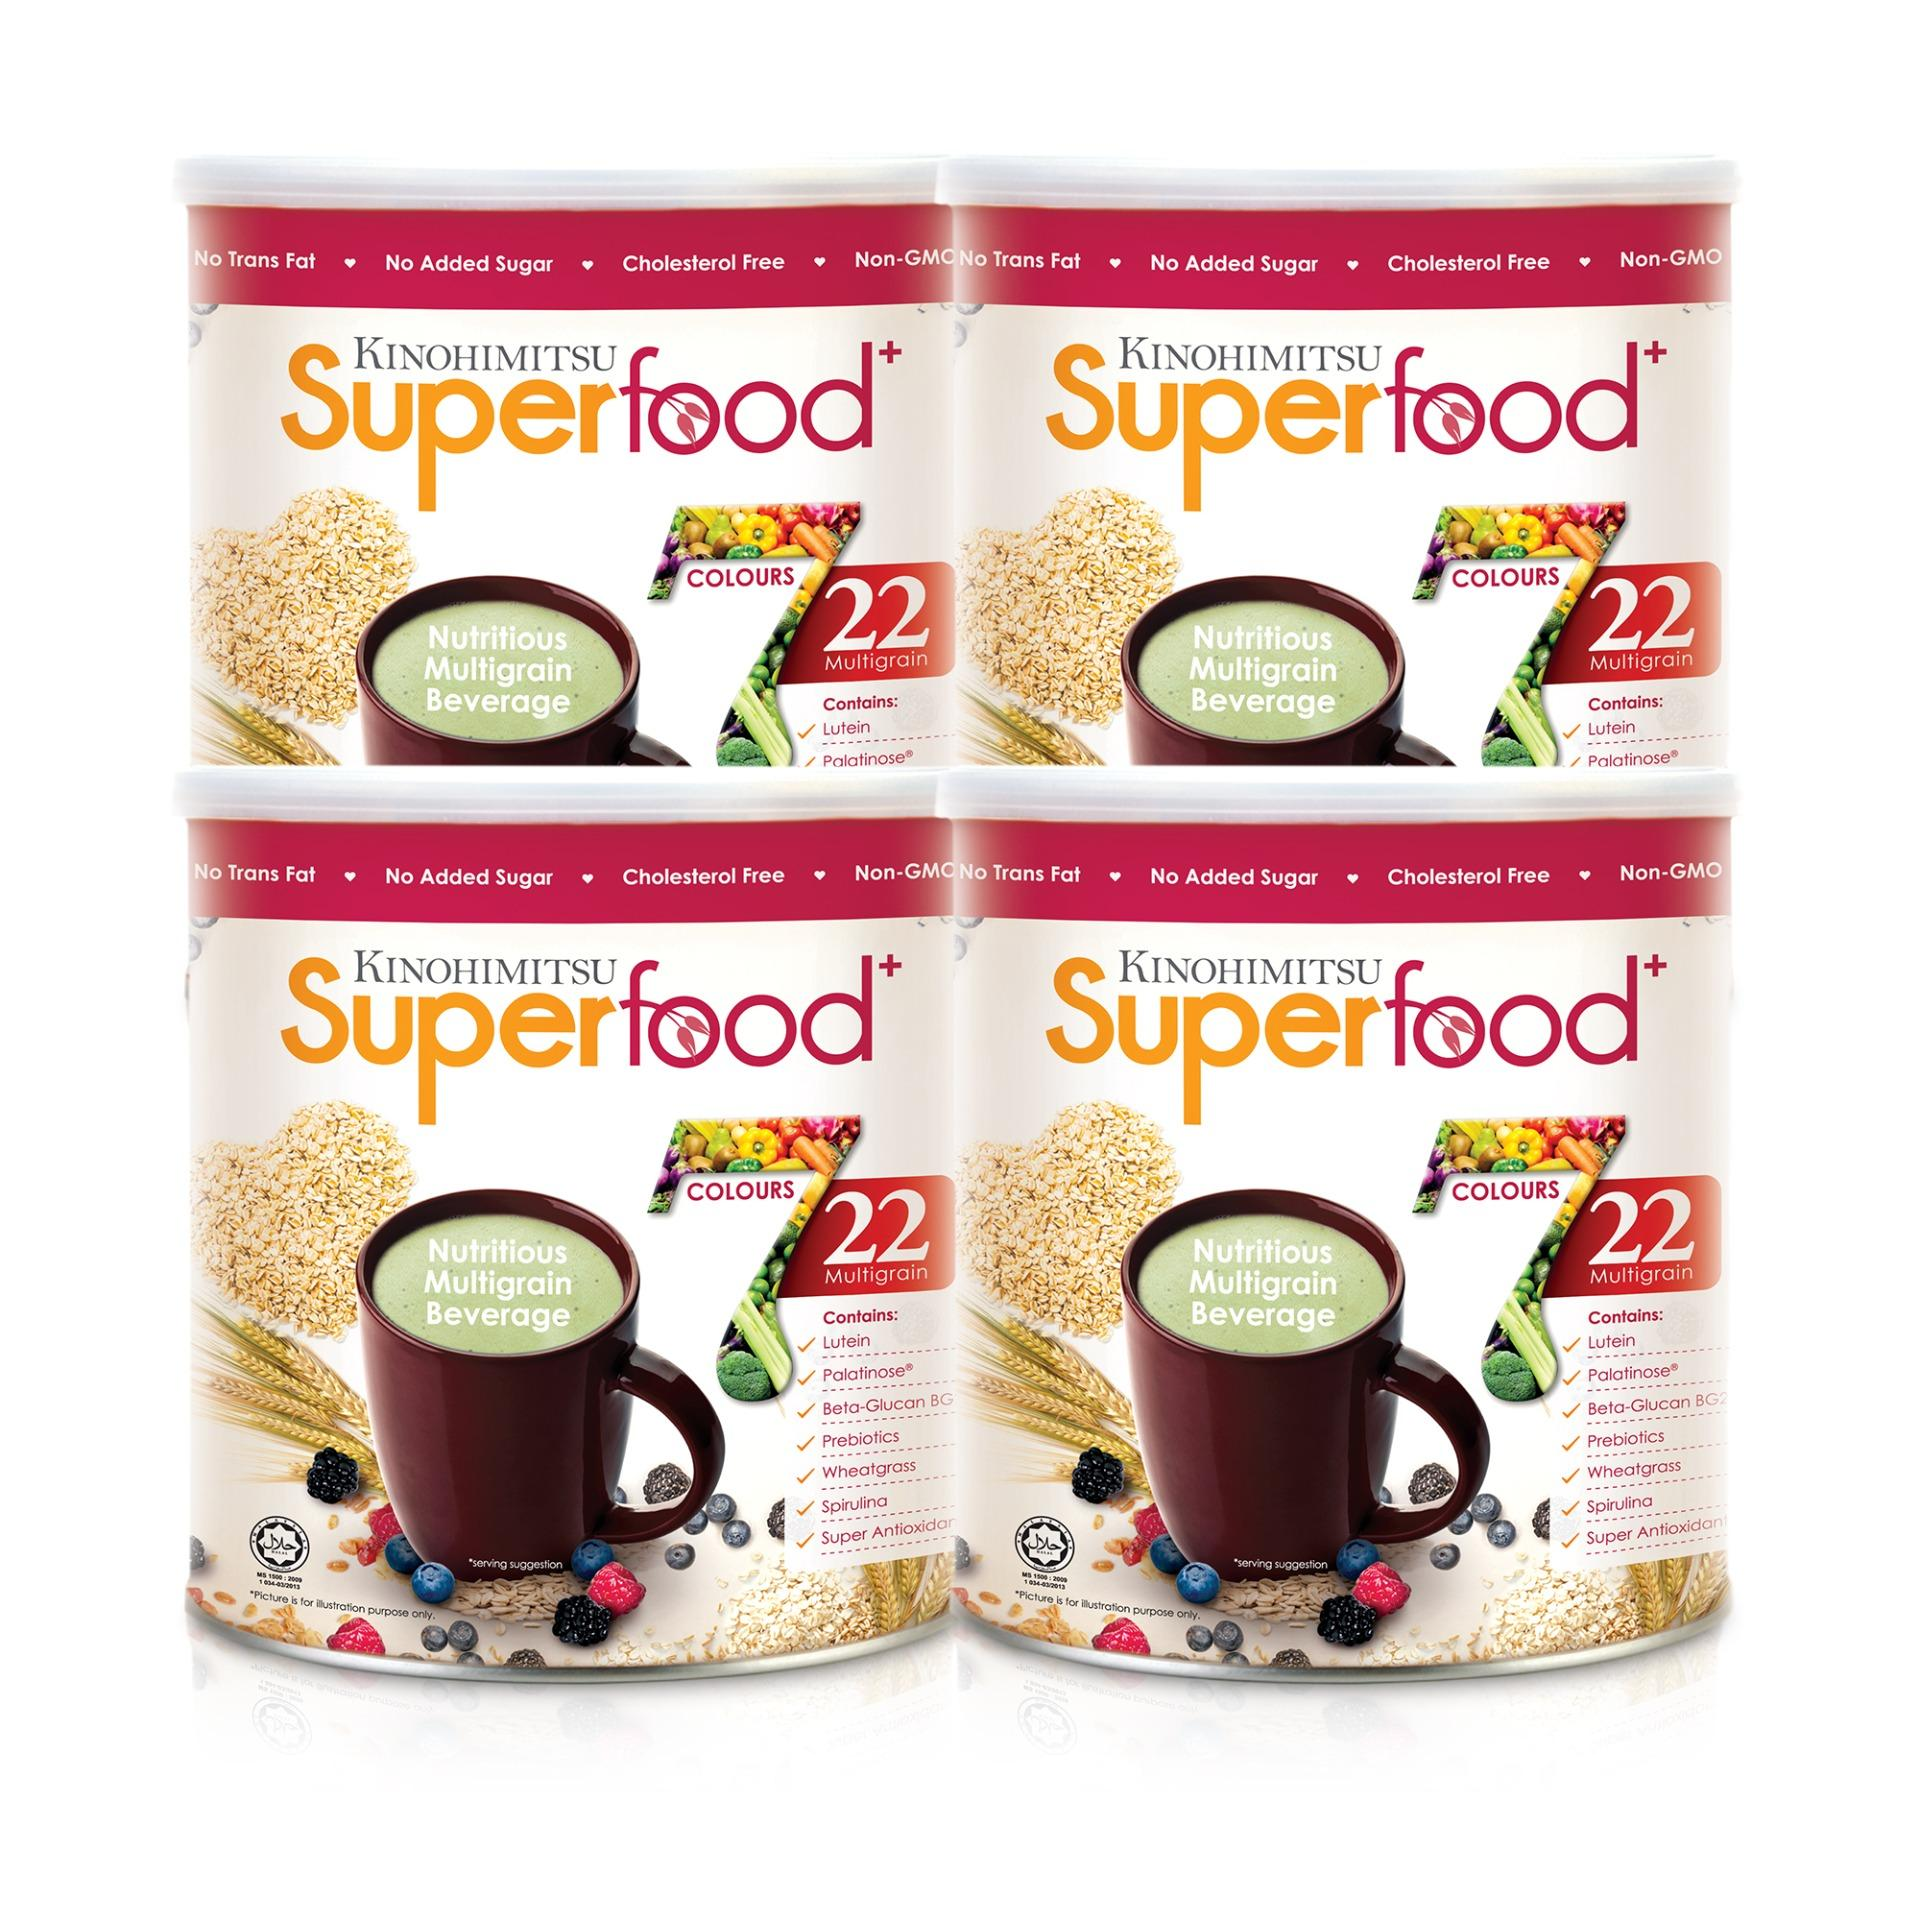 Kinohimitsu Superfood+ Tin 500g 4 Months Supply